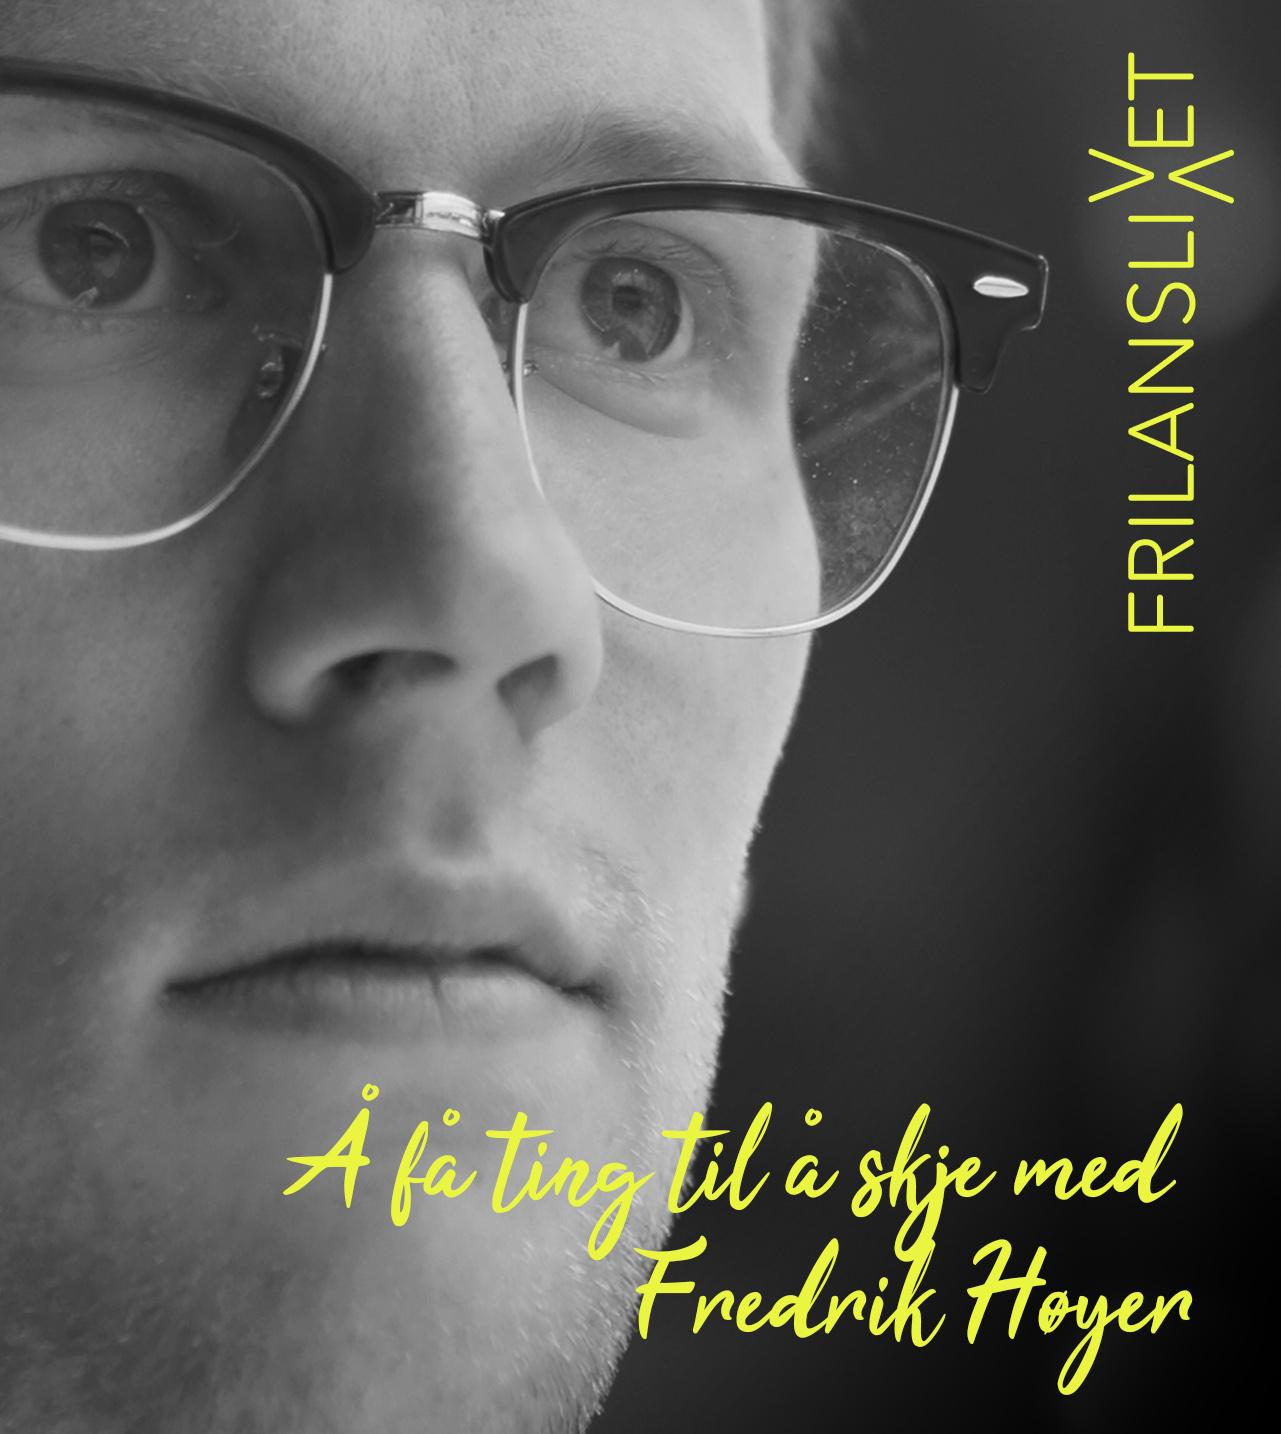 Fredrik Høyer